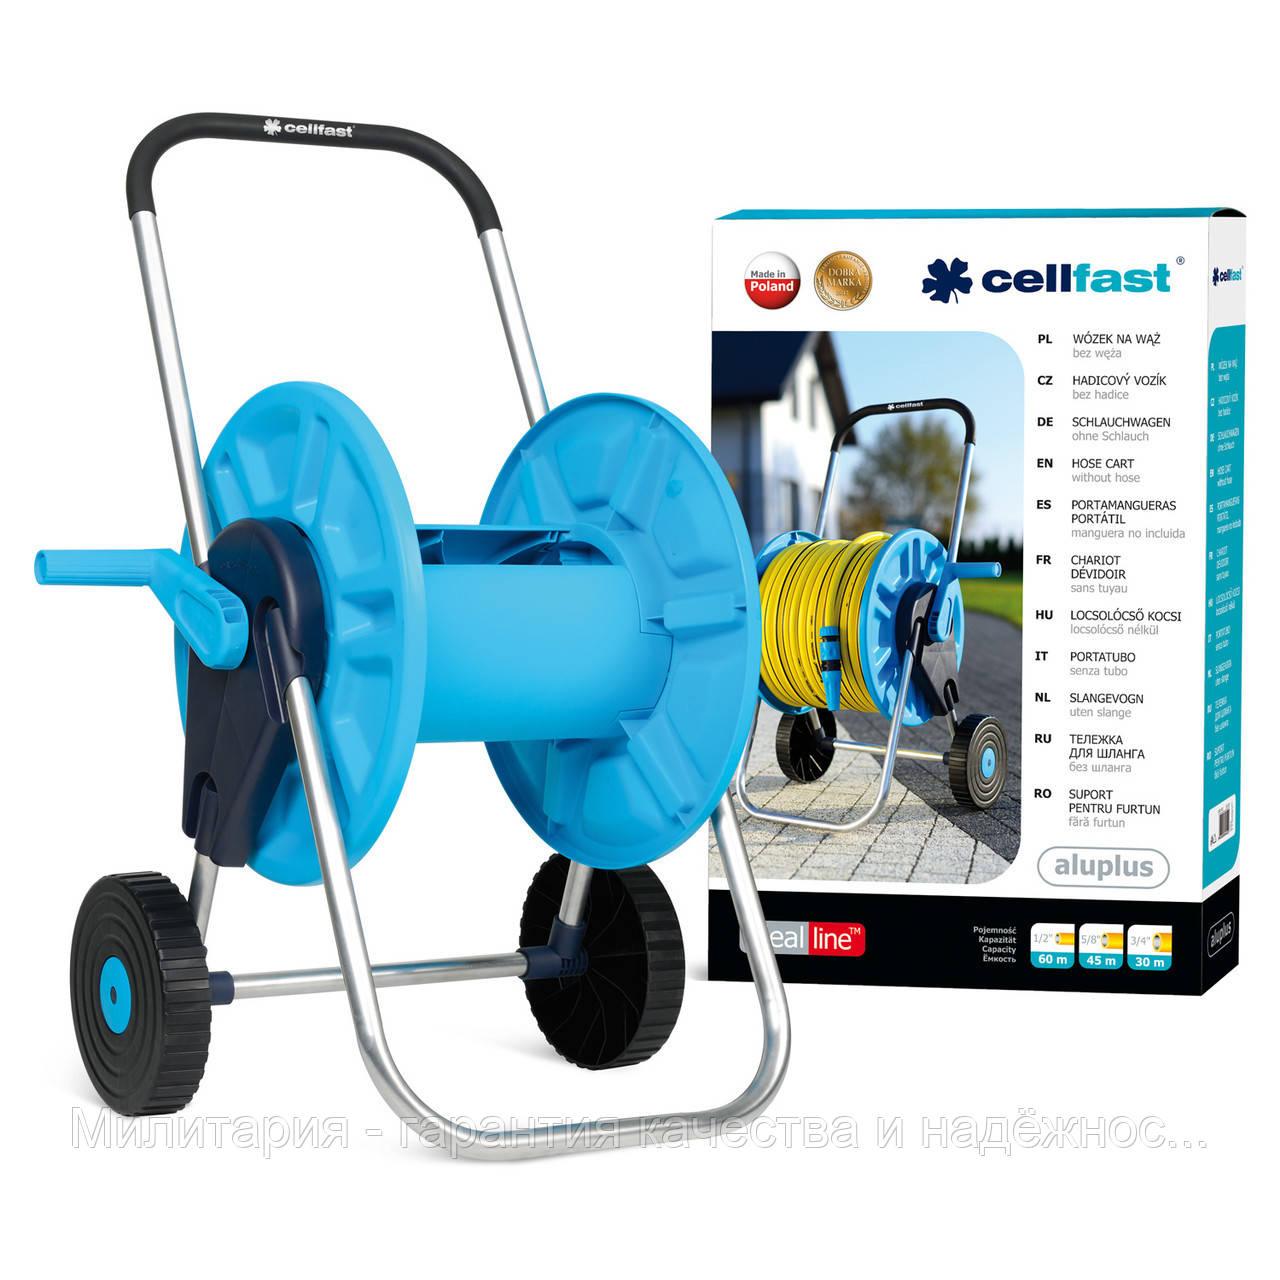 Тележка для шланга ALUPLUS (Cellfast) 60 метров 1/2